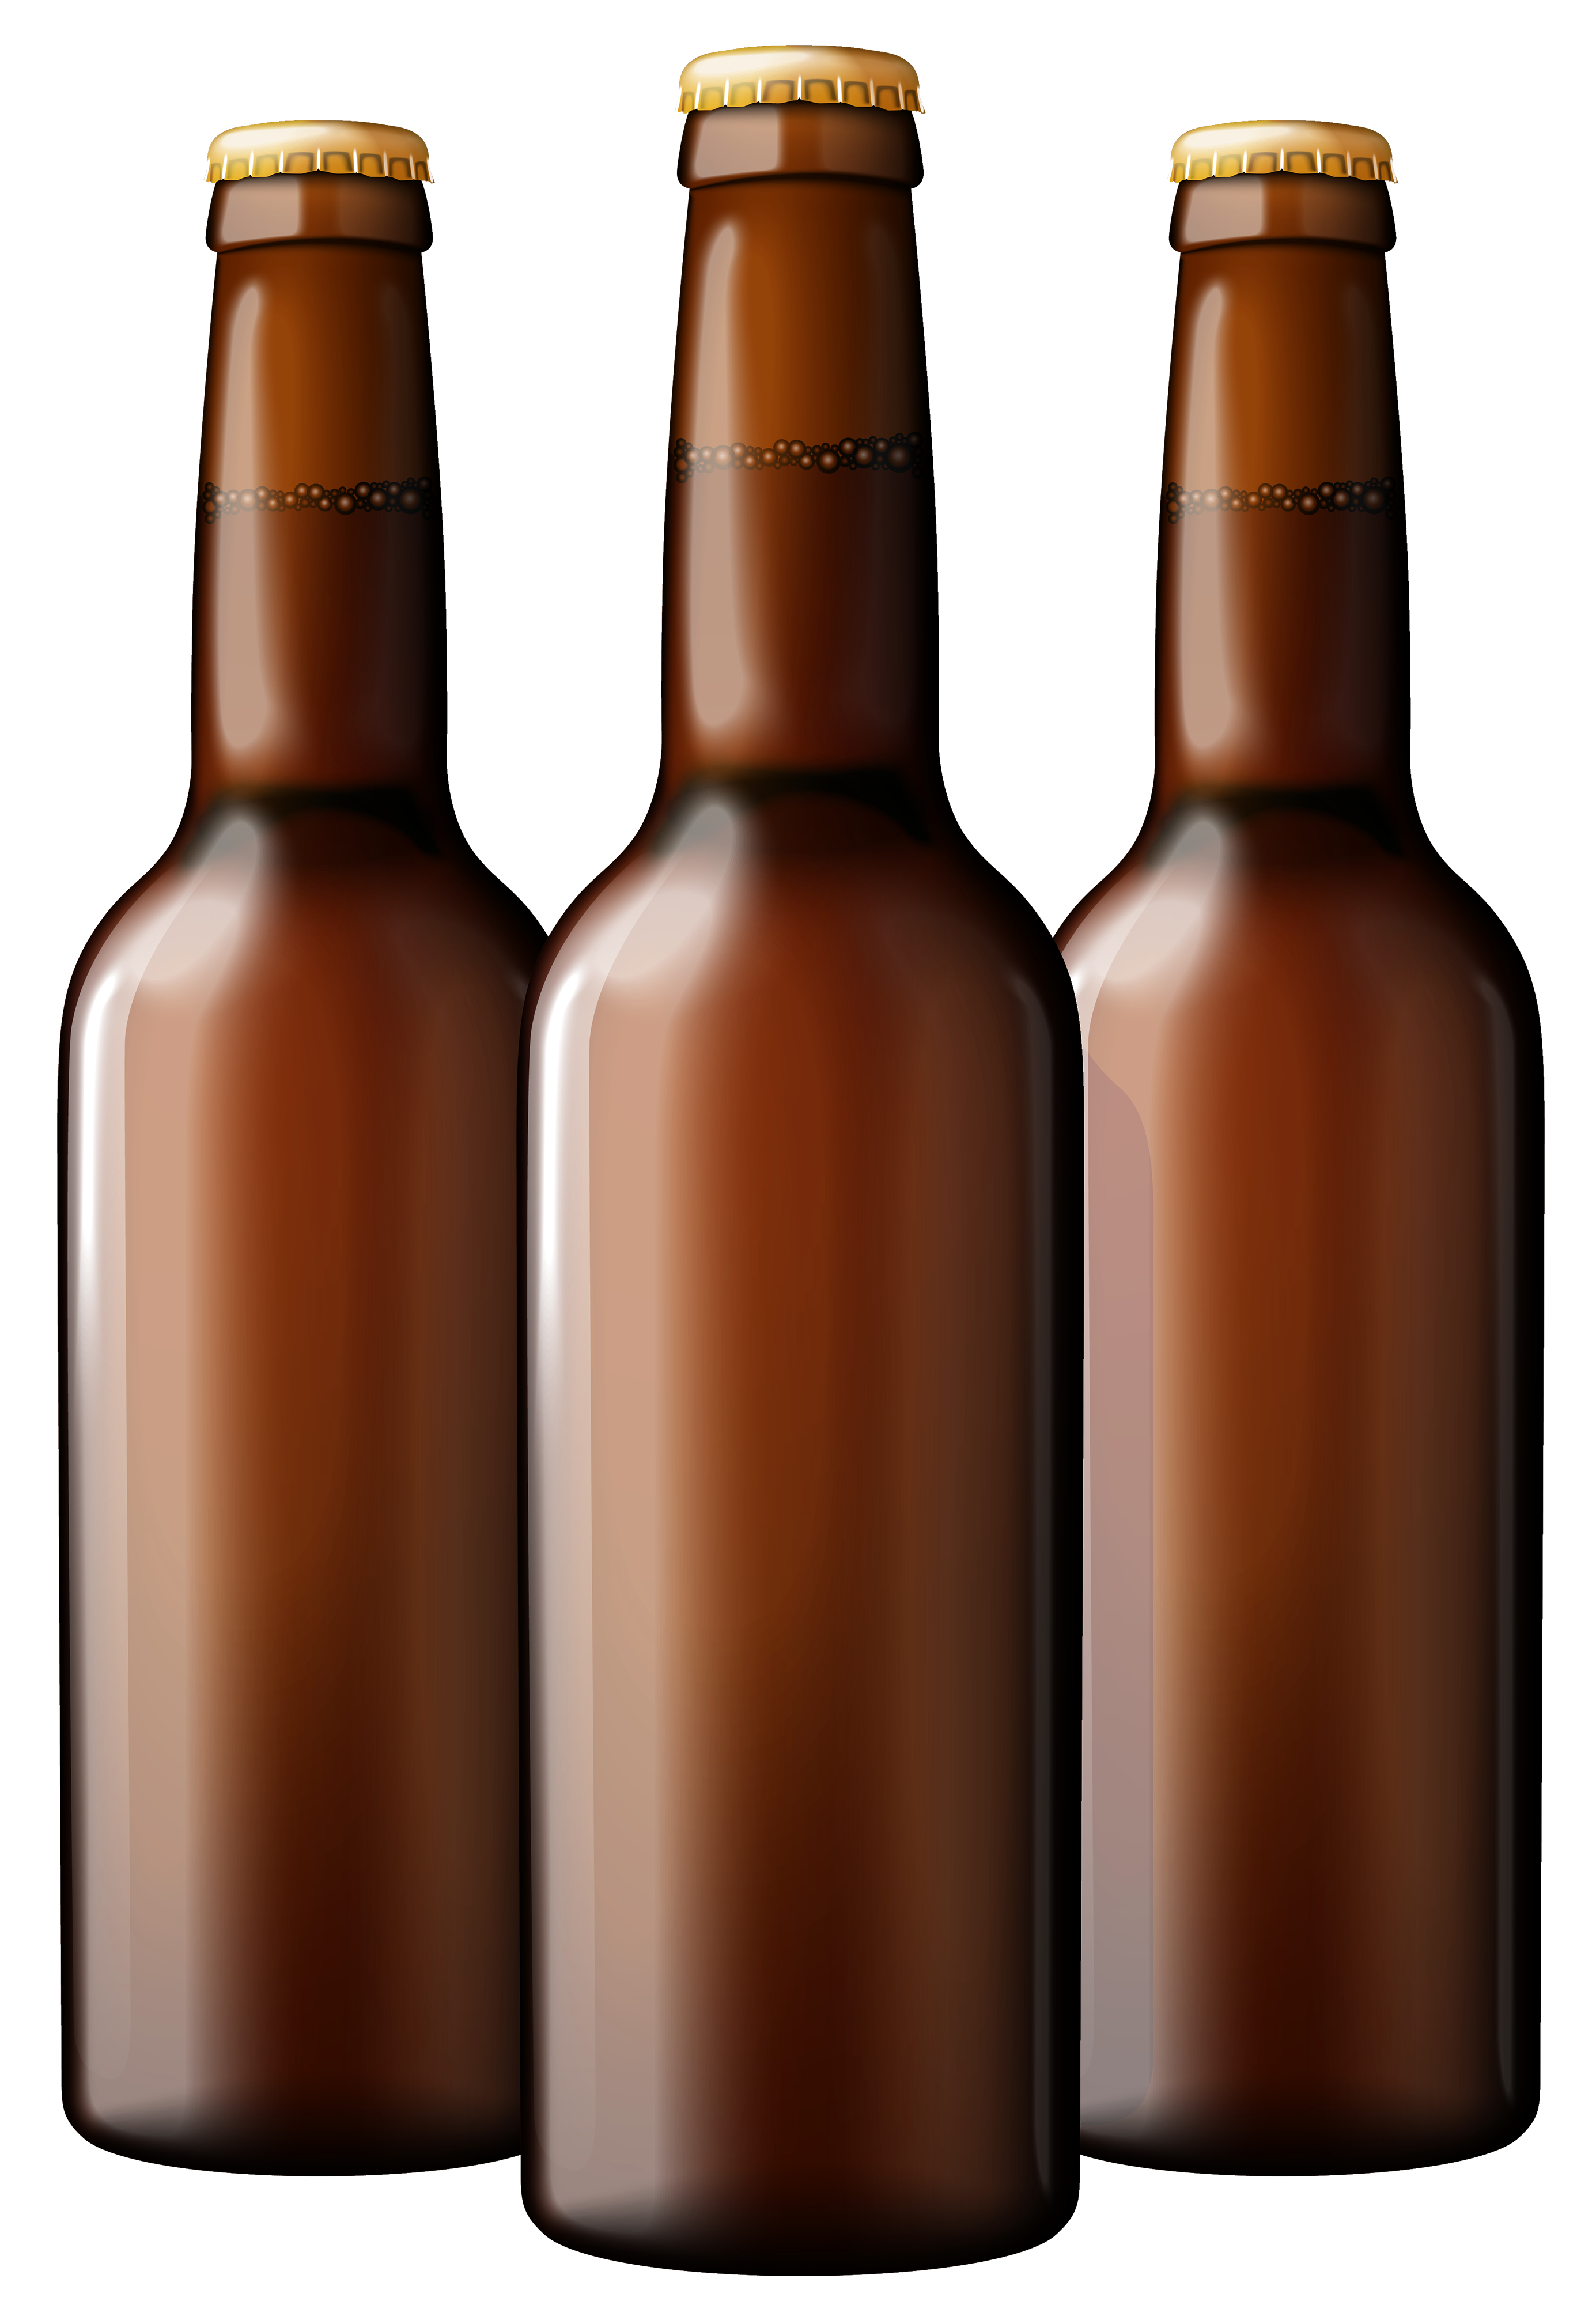 Brown Beer Bottles PNG Clipart - Beer Bottle PNG HD